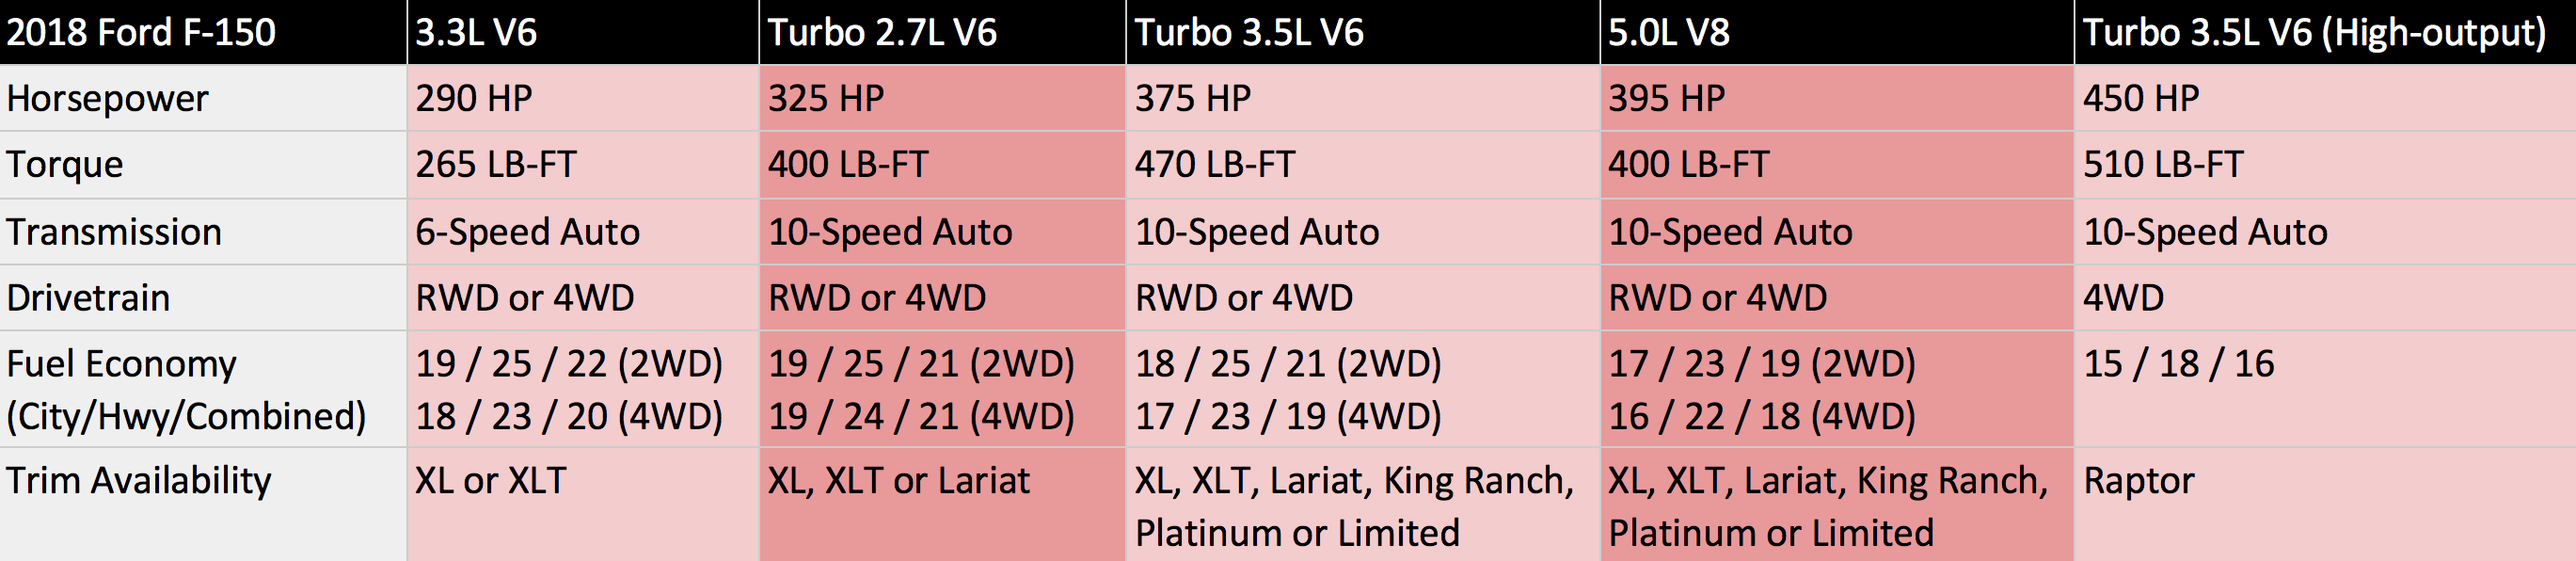 2018 Ford F-150 powertrain chart